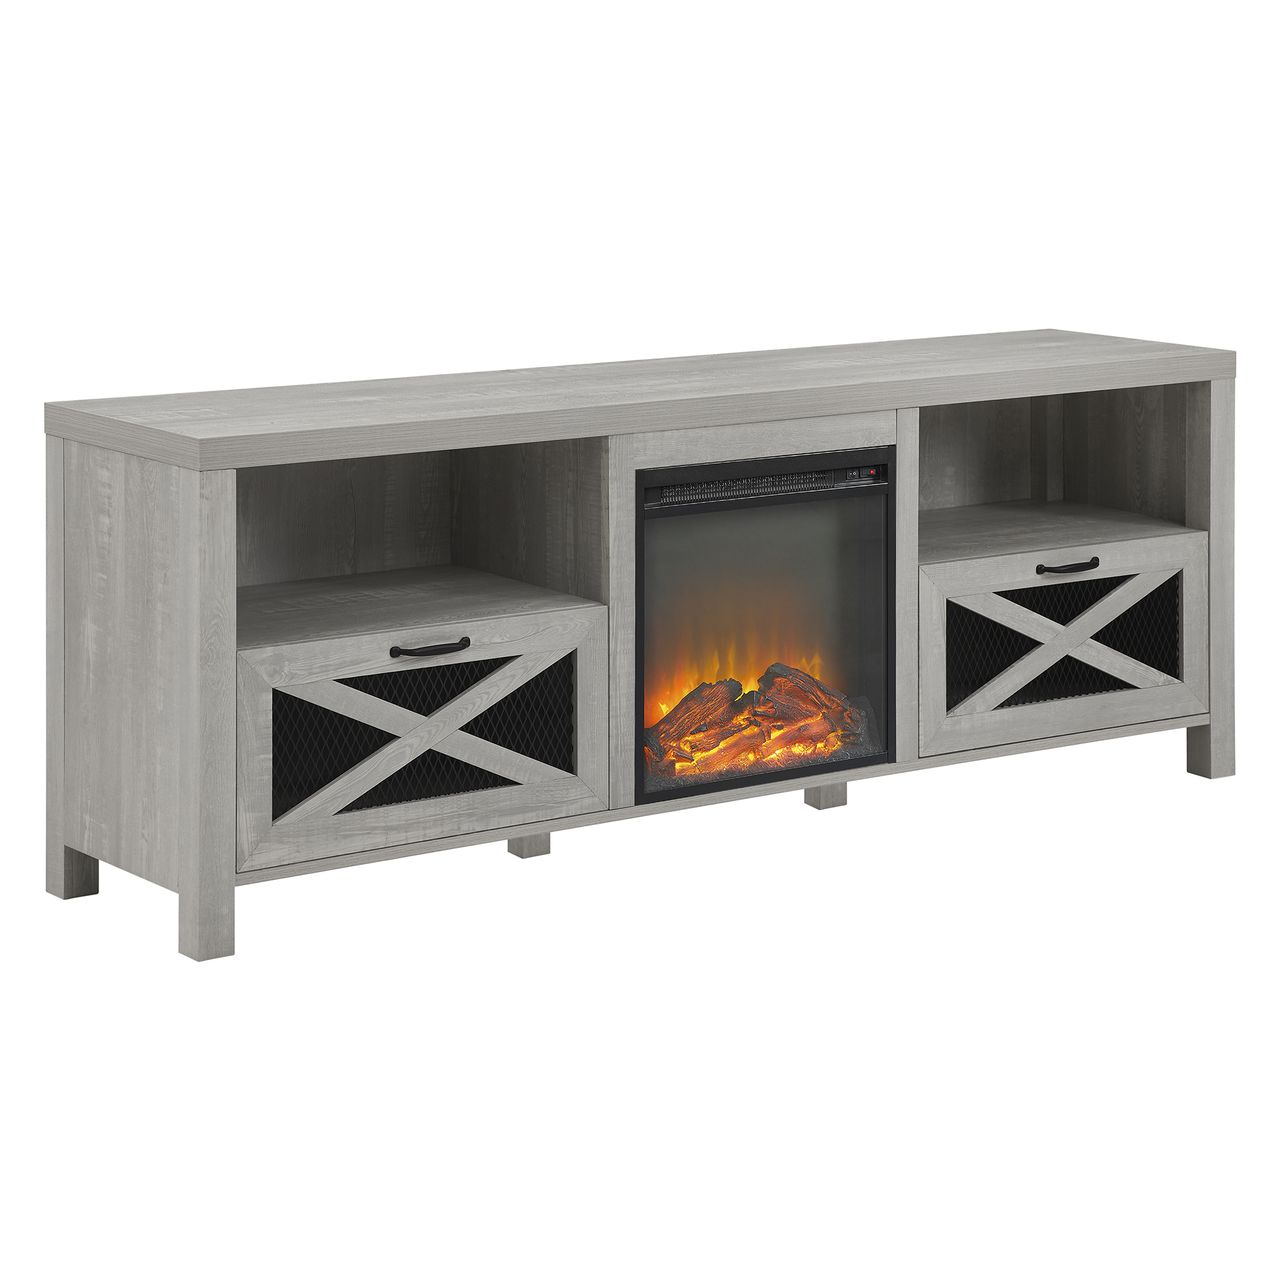 "Walker Edison Abilene 70"" Farmhouse Fireplace TV Stand - Stone Grey"